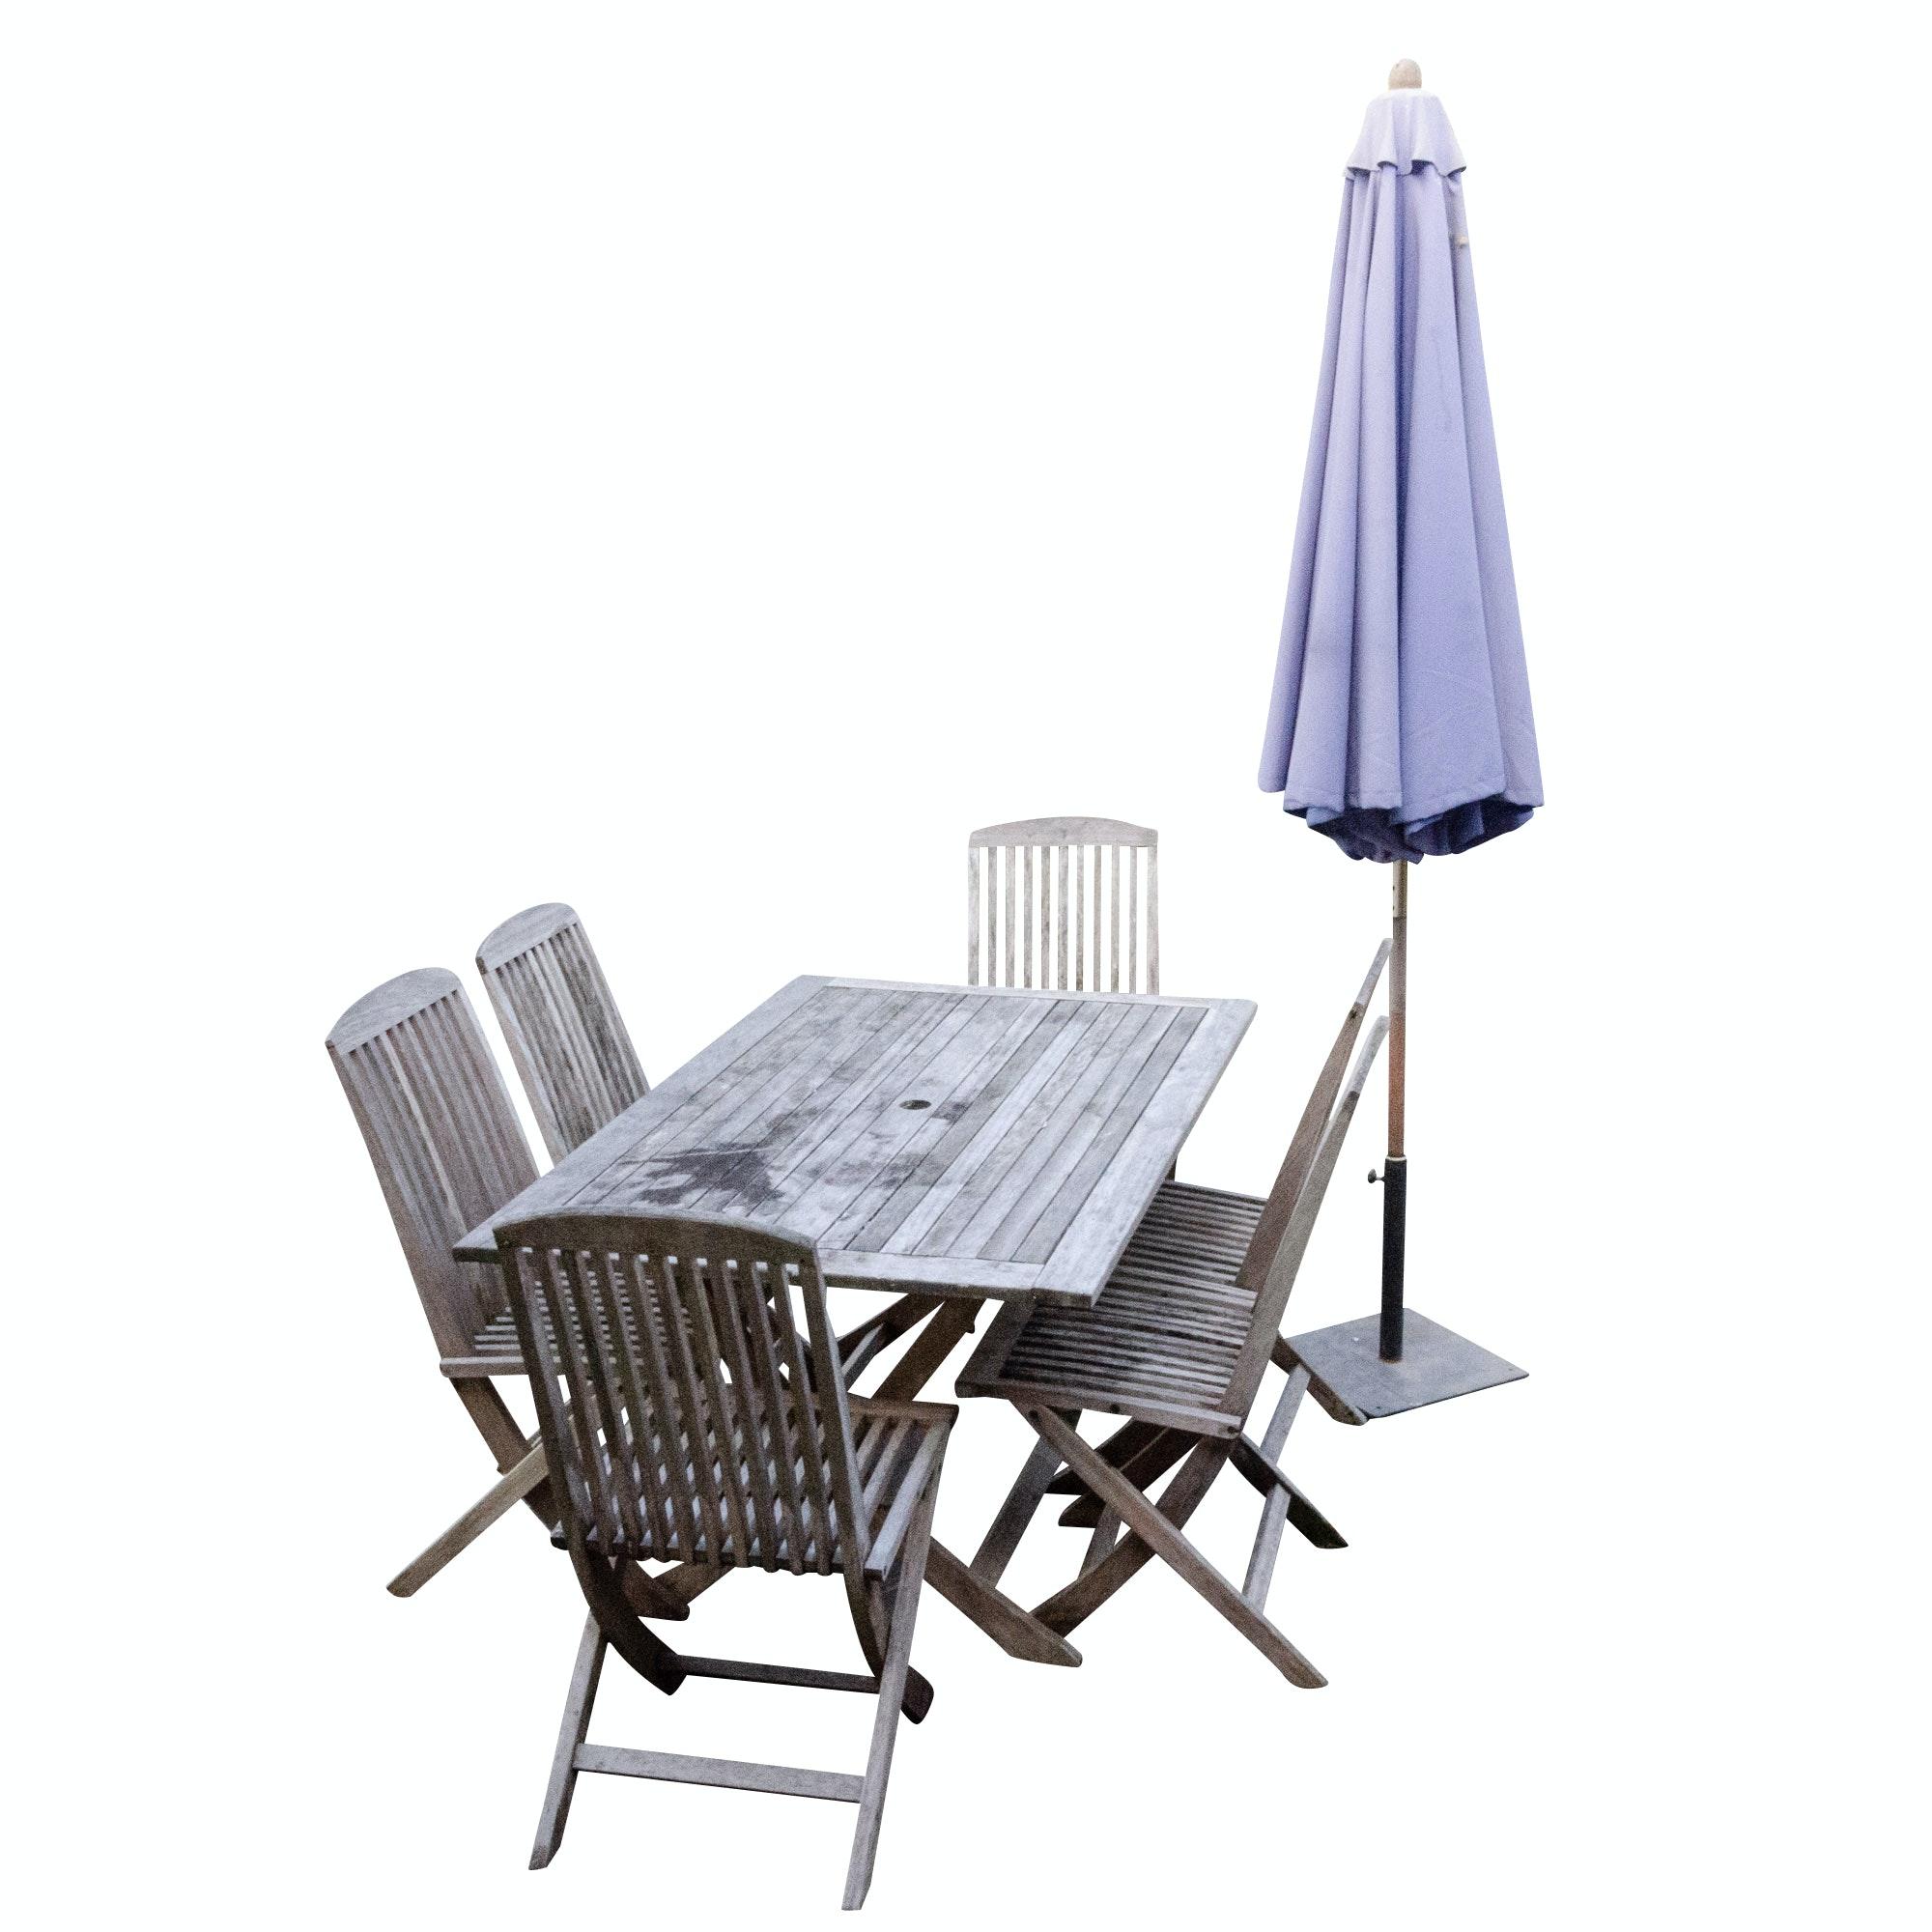 sc 1 st  EBTH.com & Teak Patio Dining Table Six Folding Chairs and Patio Umbrella : EBTH